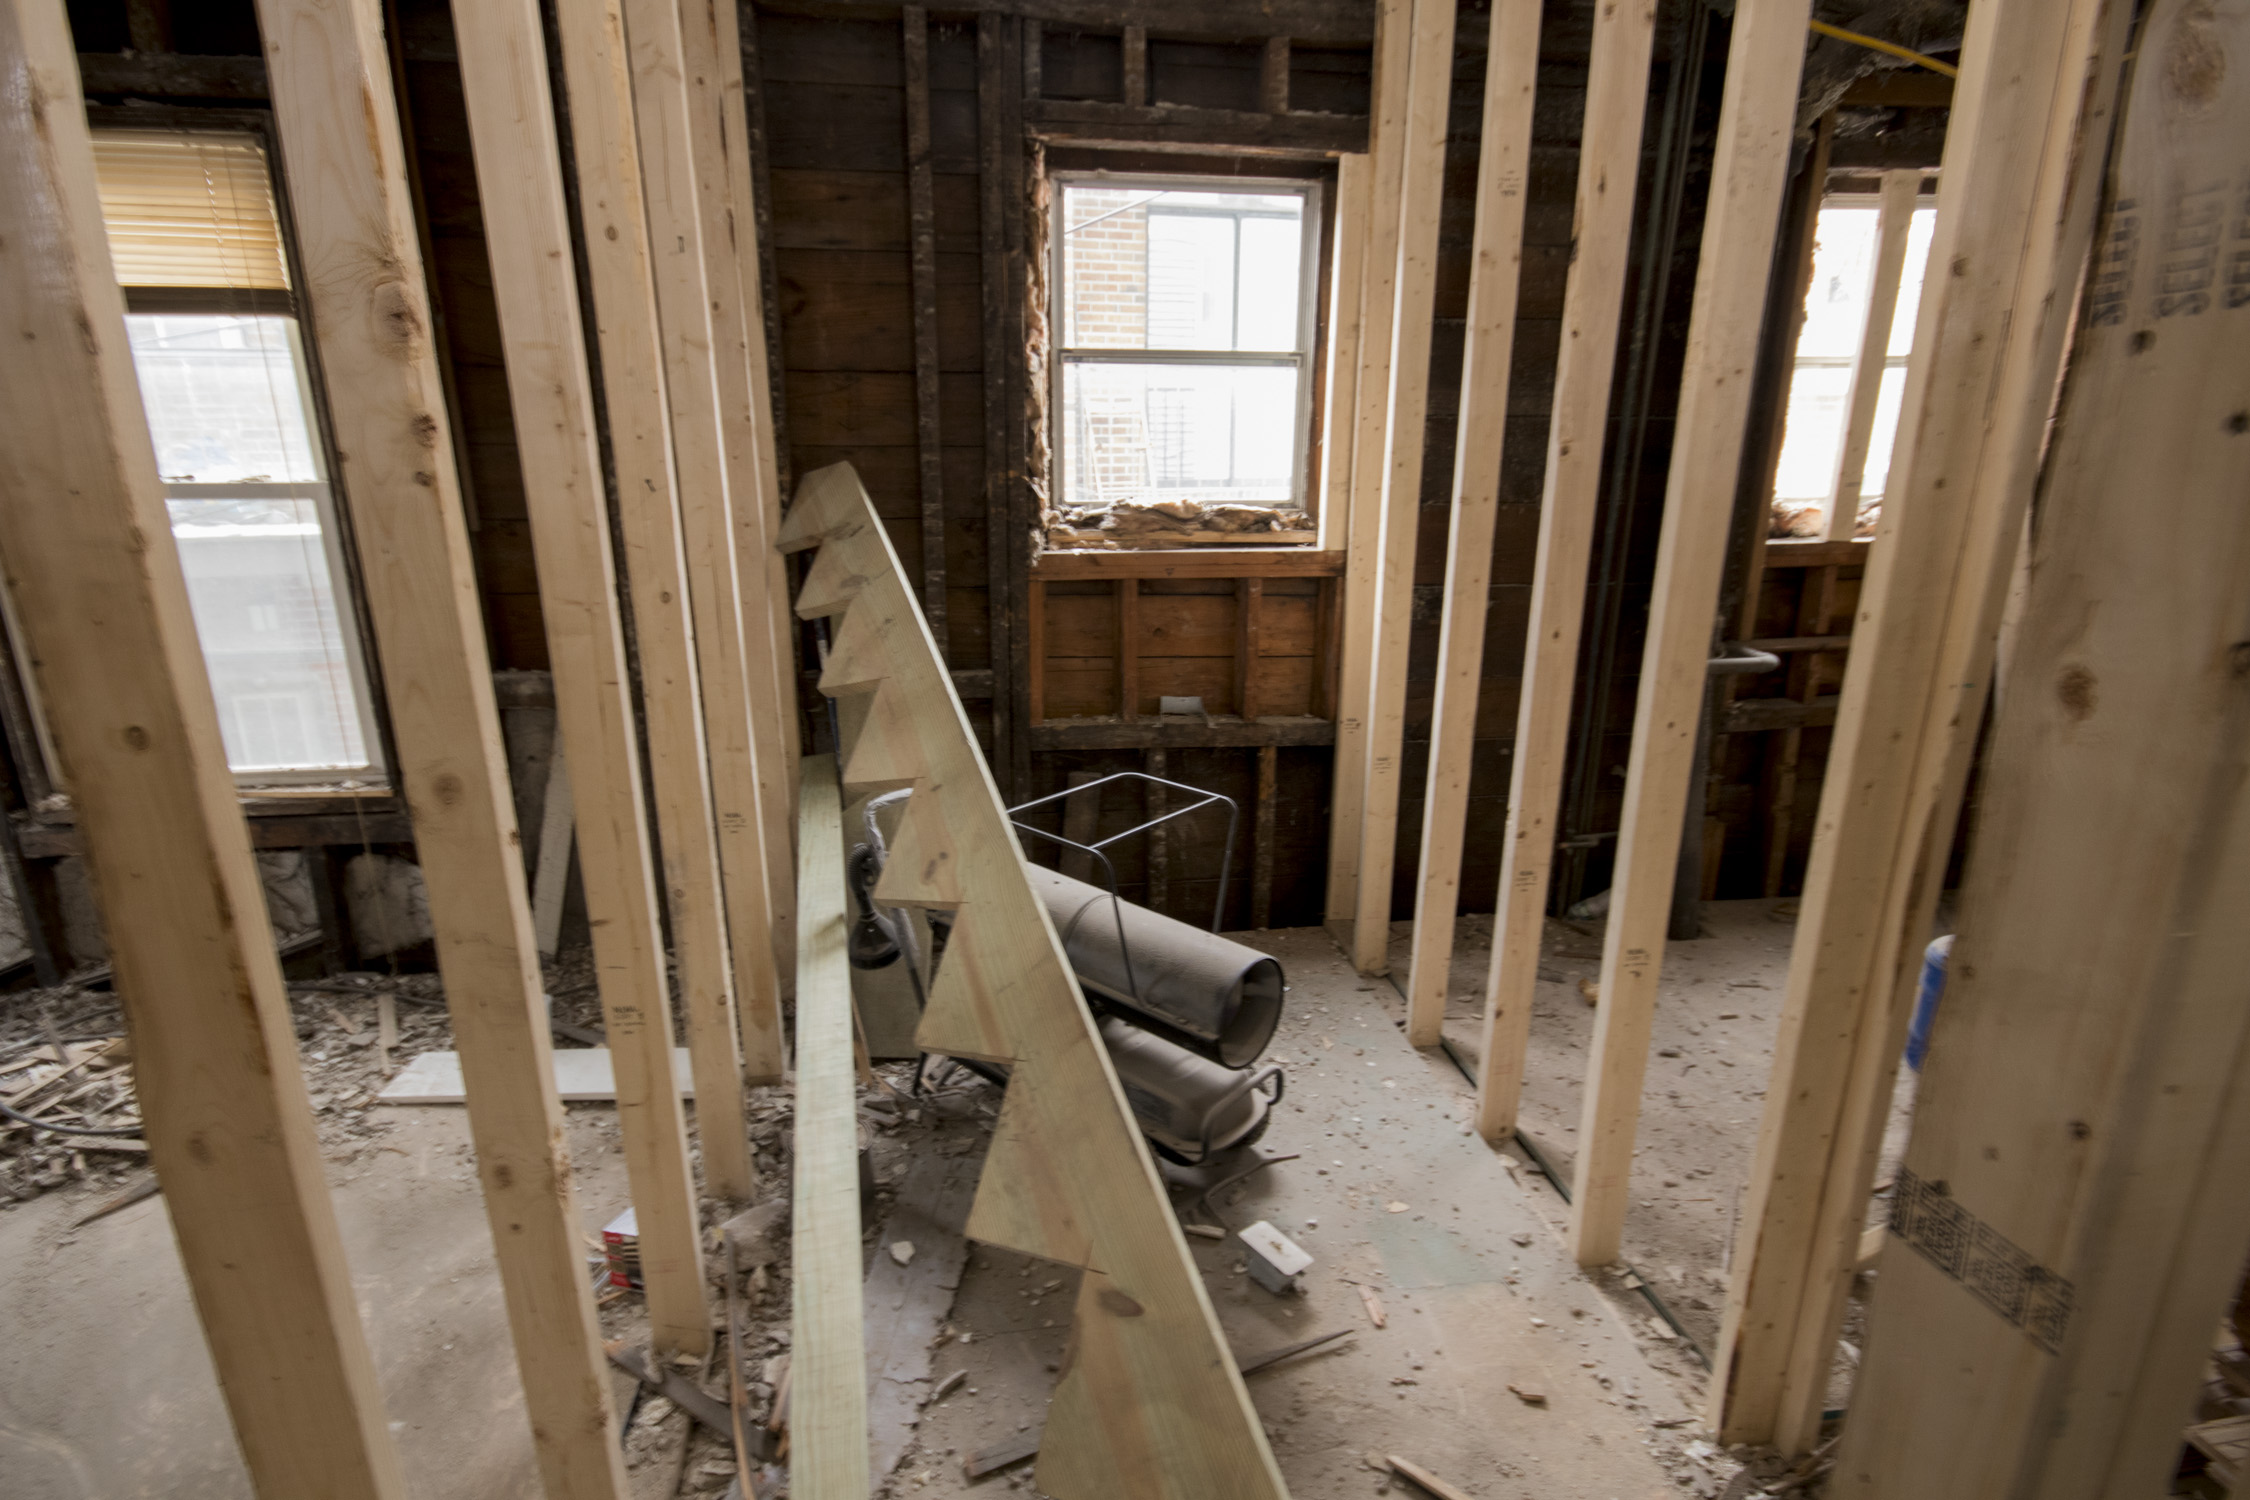 25 Darling St Boston General Contractors P Northeast Contractors_71